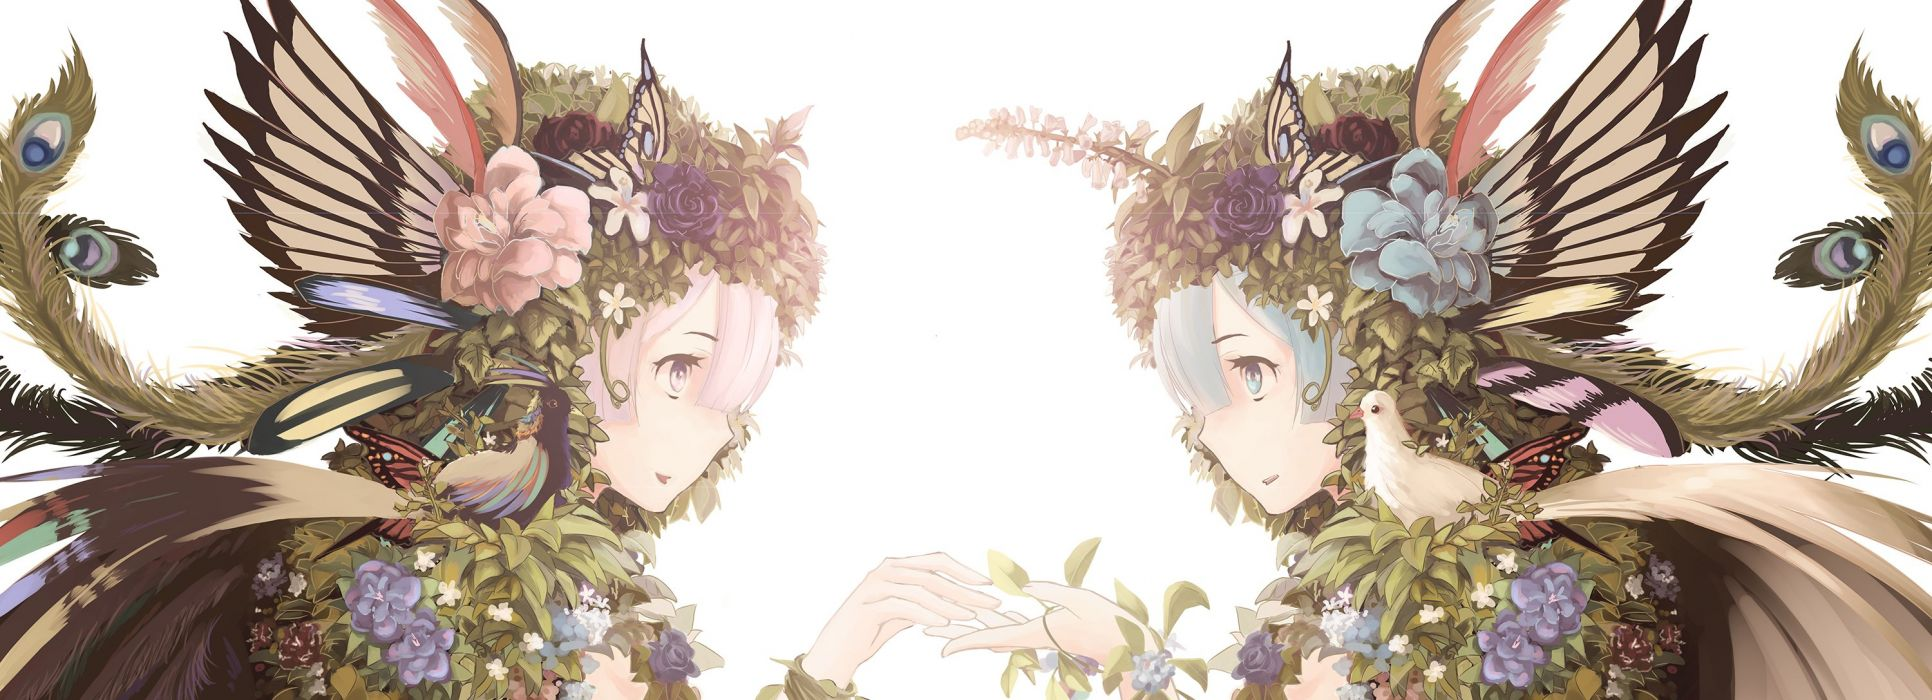 girls animal bird blue hair butterfly close feathers flowers leaves myrt1e pink hair ram (re-zero) rem (re-zero) rose twins wallpaper